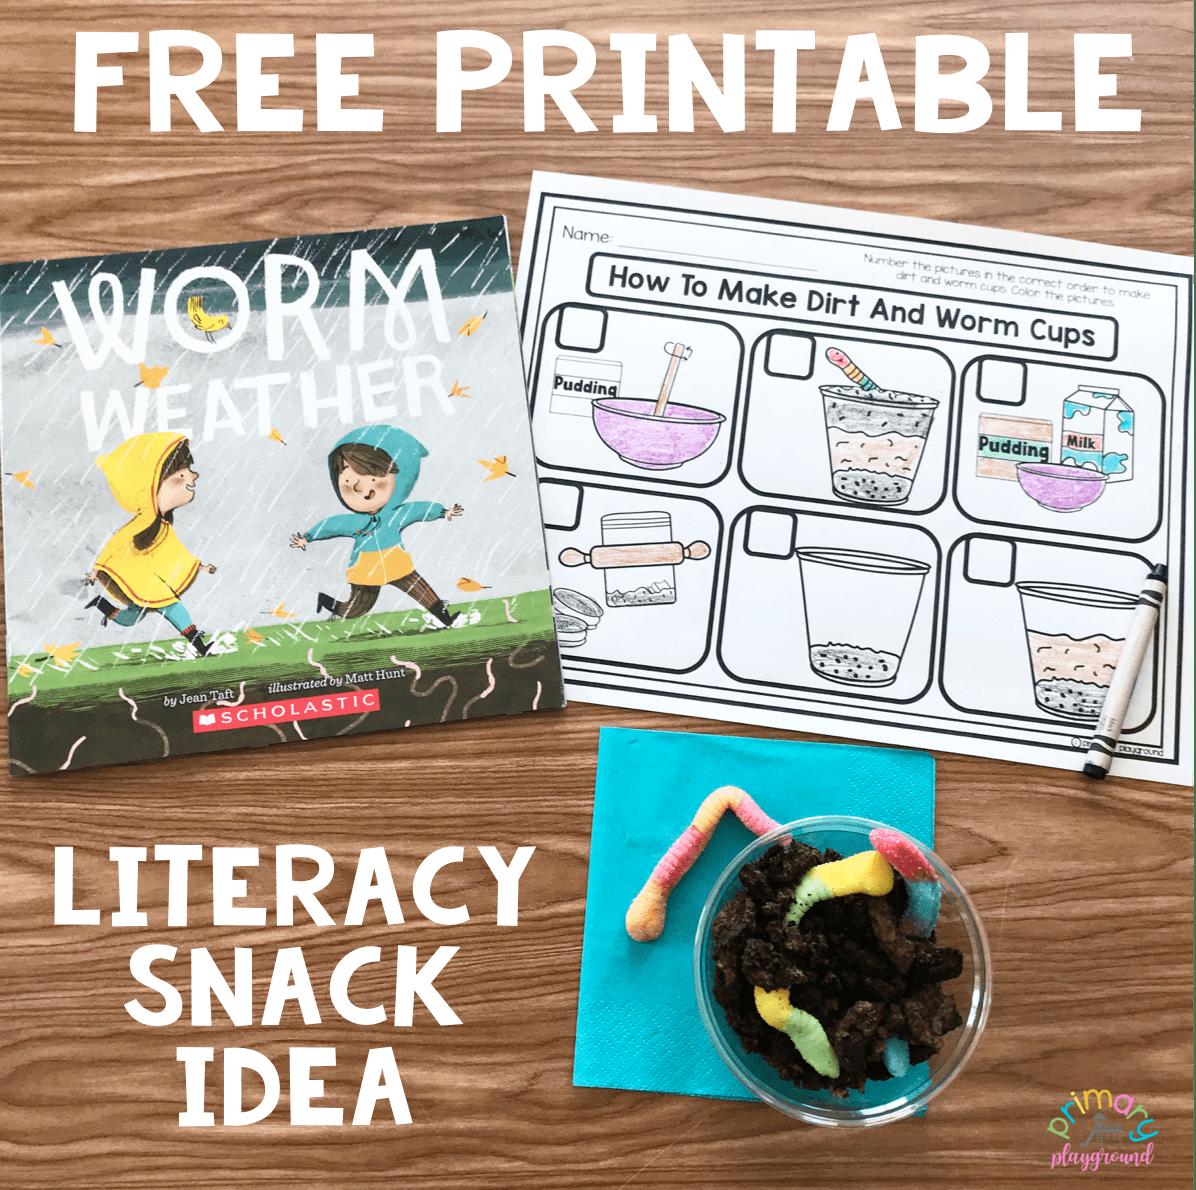 Literacy Snack Idea Worms Free Printable